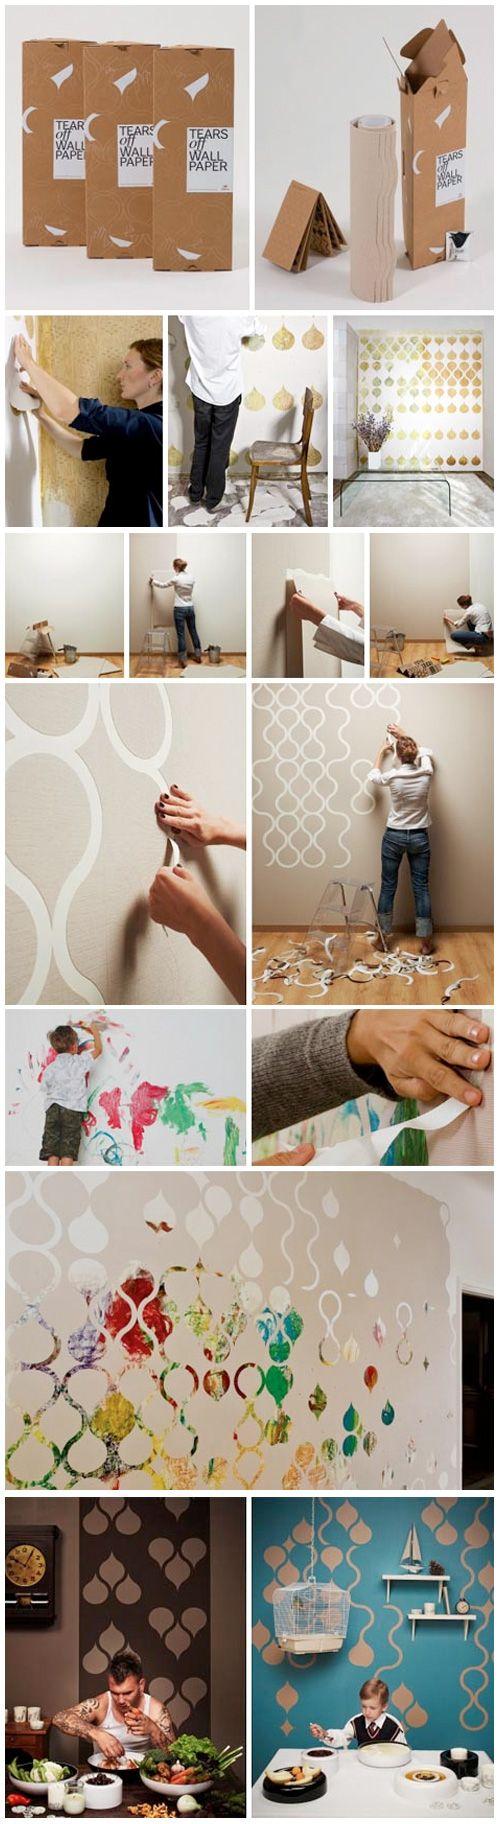 diy wall design, bathroom